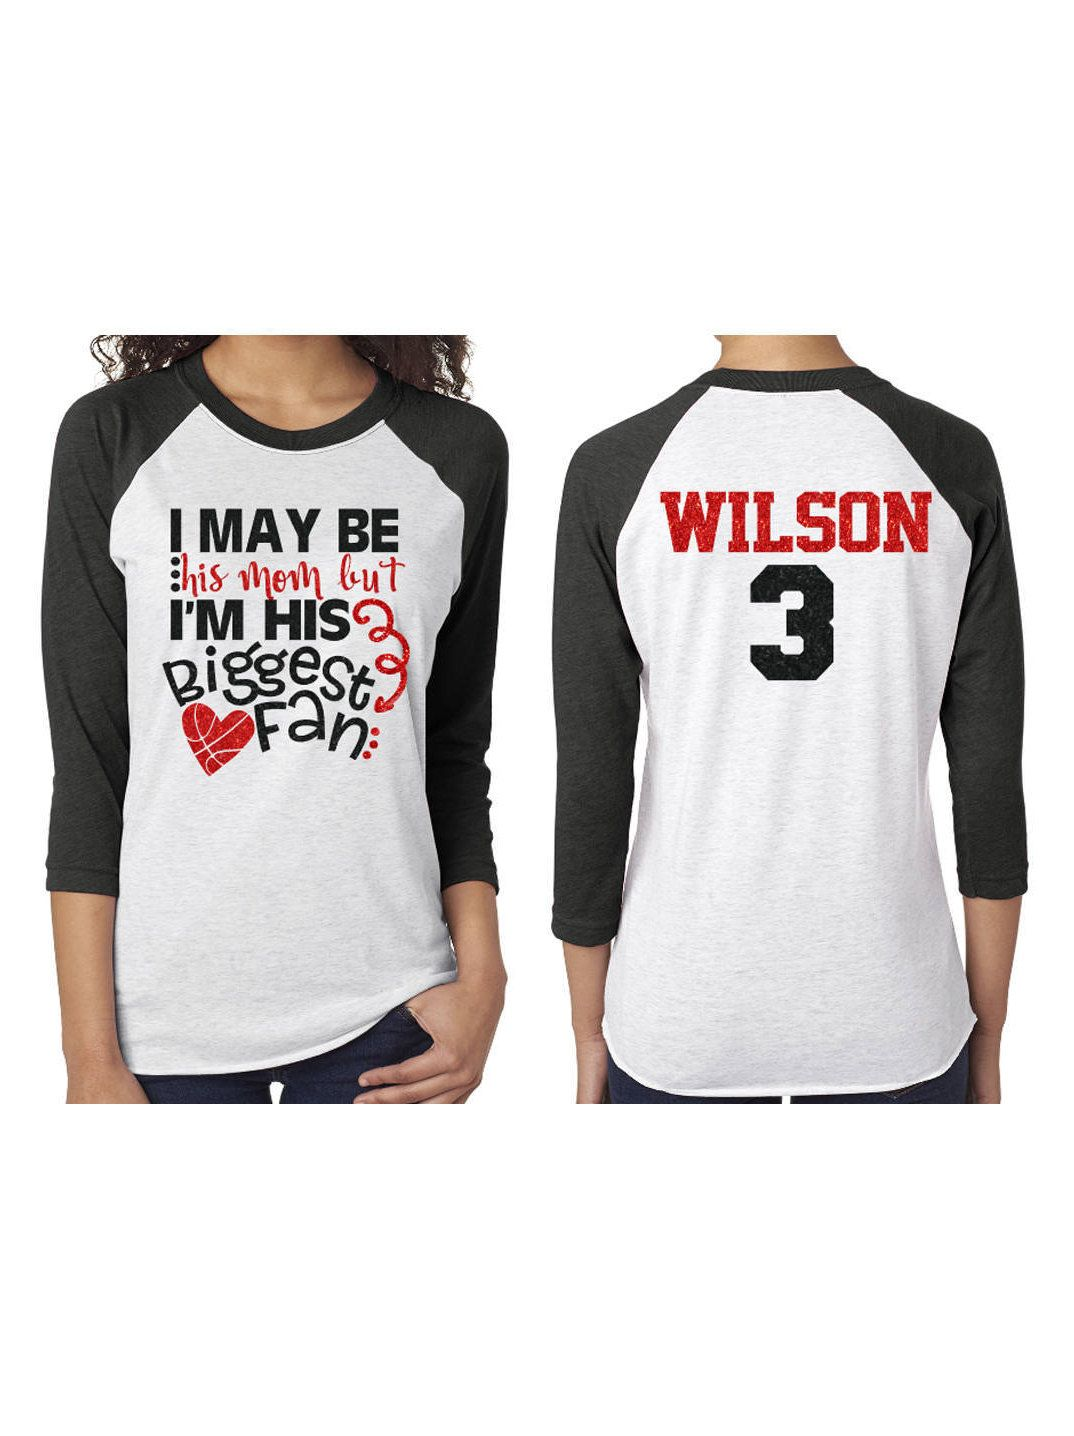 389a9e7e Glitter I May be his Mom but I'm his Biggest Fan Baseball Shirt|Customized  3/4 Sleeve Raglan by GavinsAllyeDesigns on Etsy